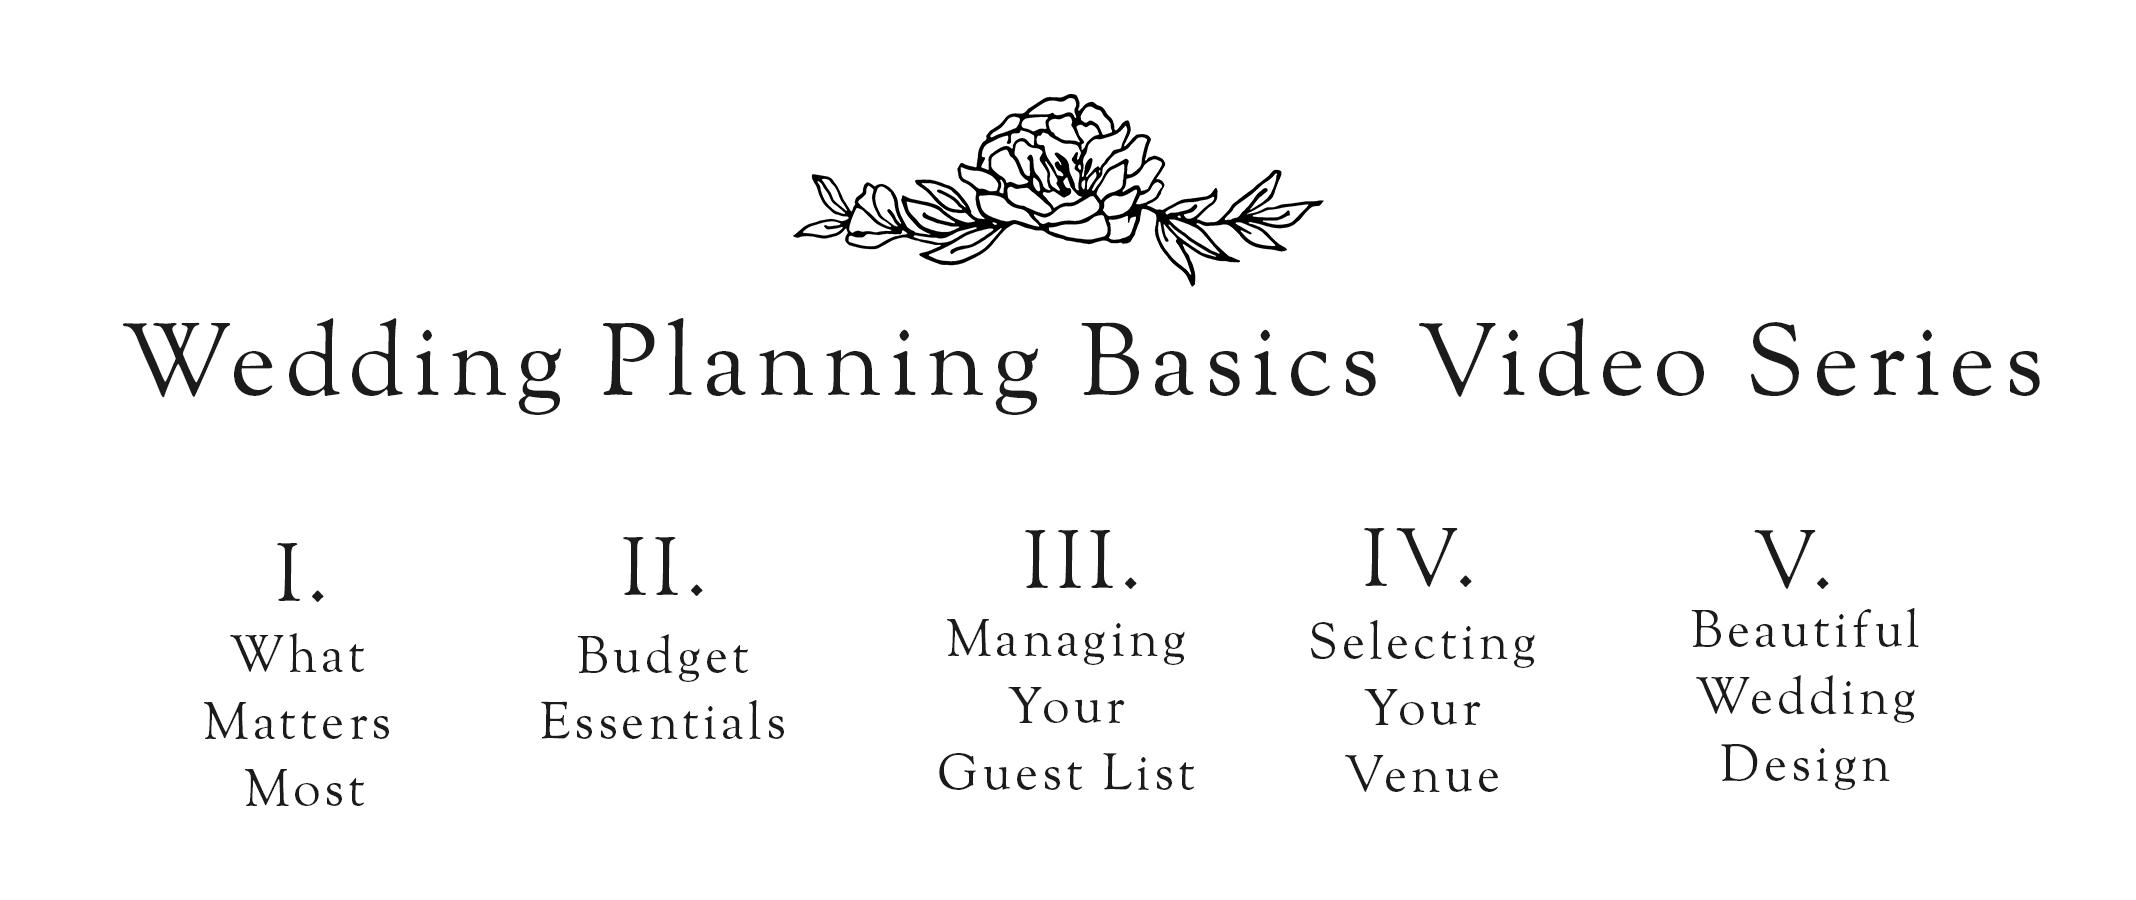 Heirloom Event Co. | Wedding Planning Basics Video Series